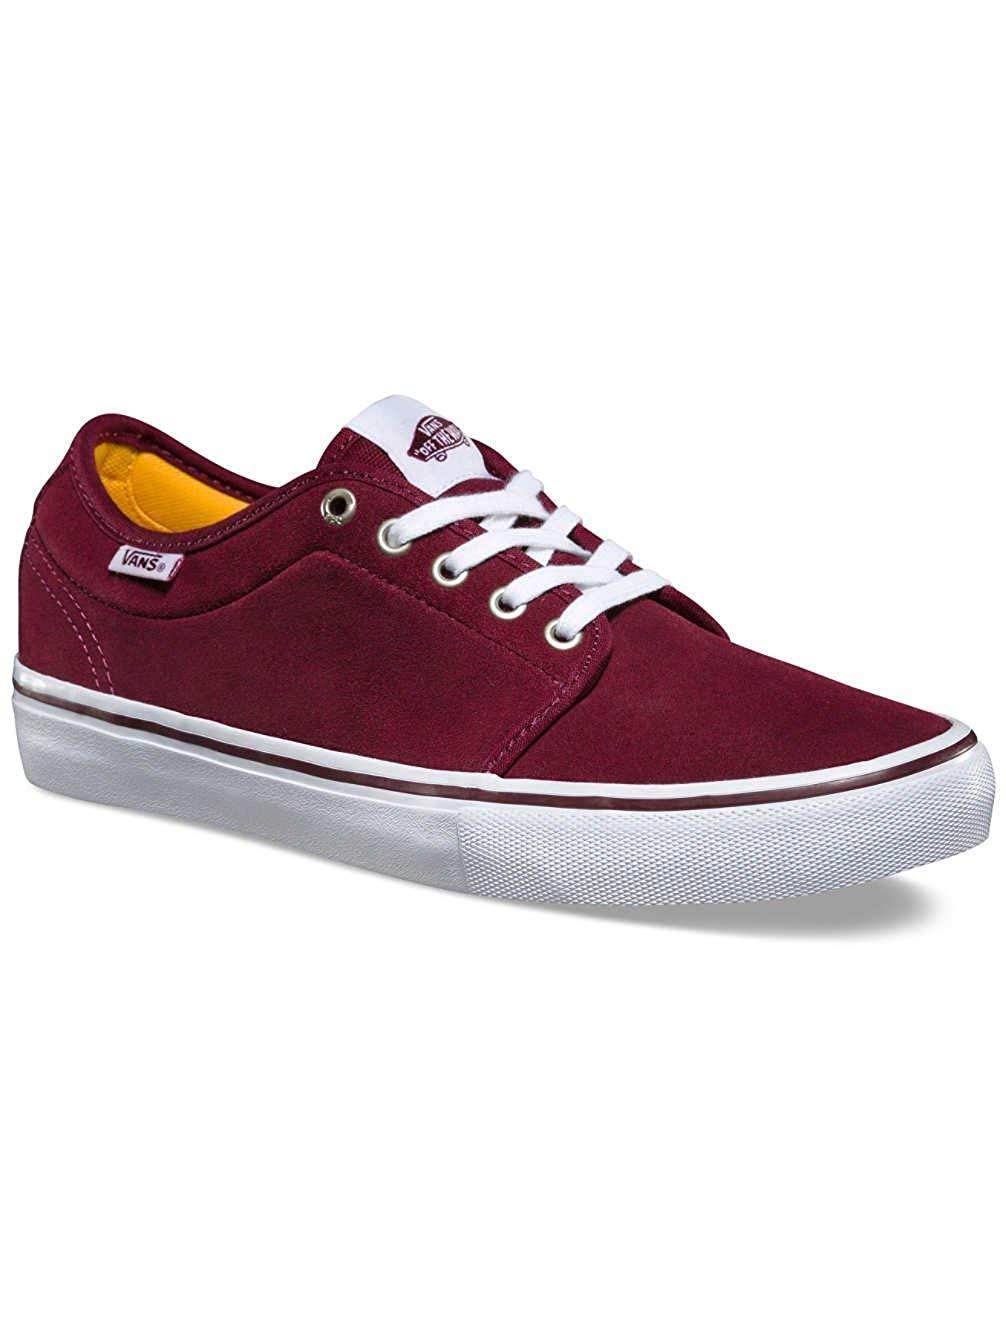 Vans CHUKKA CHUKKA CHUKKA LOW PRO PORT bianca Uomo 6 - 8 scarpe NEW SKATE NIB SK8 viola SUEDE baaa7e